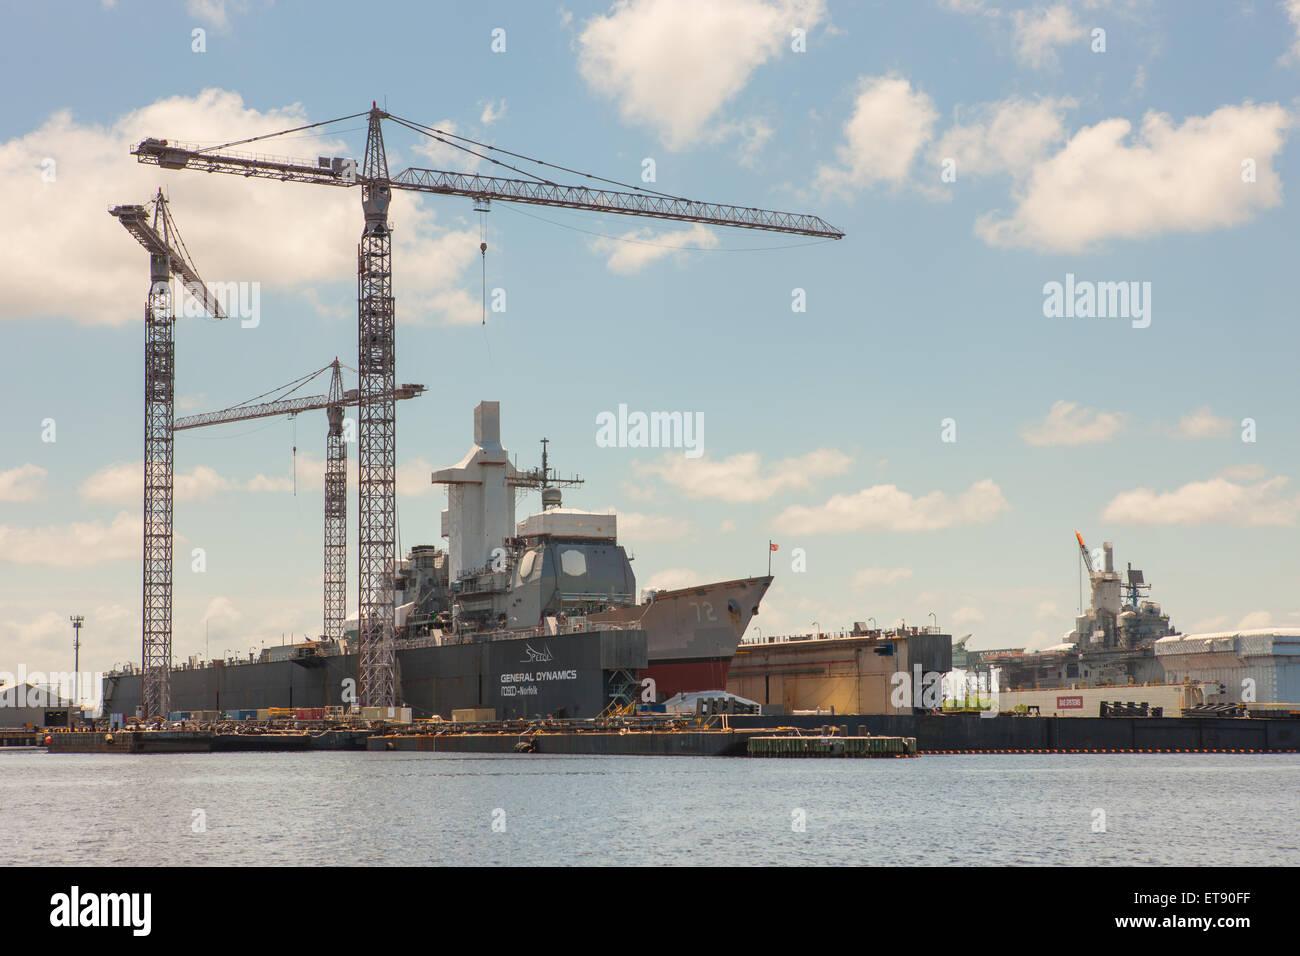 General Dynamics NASSCO shipyard in Norfolk, Virginia. - Stock Image